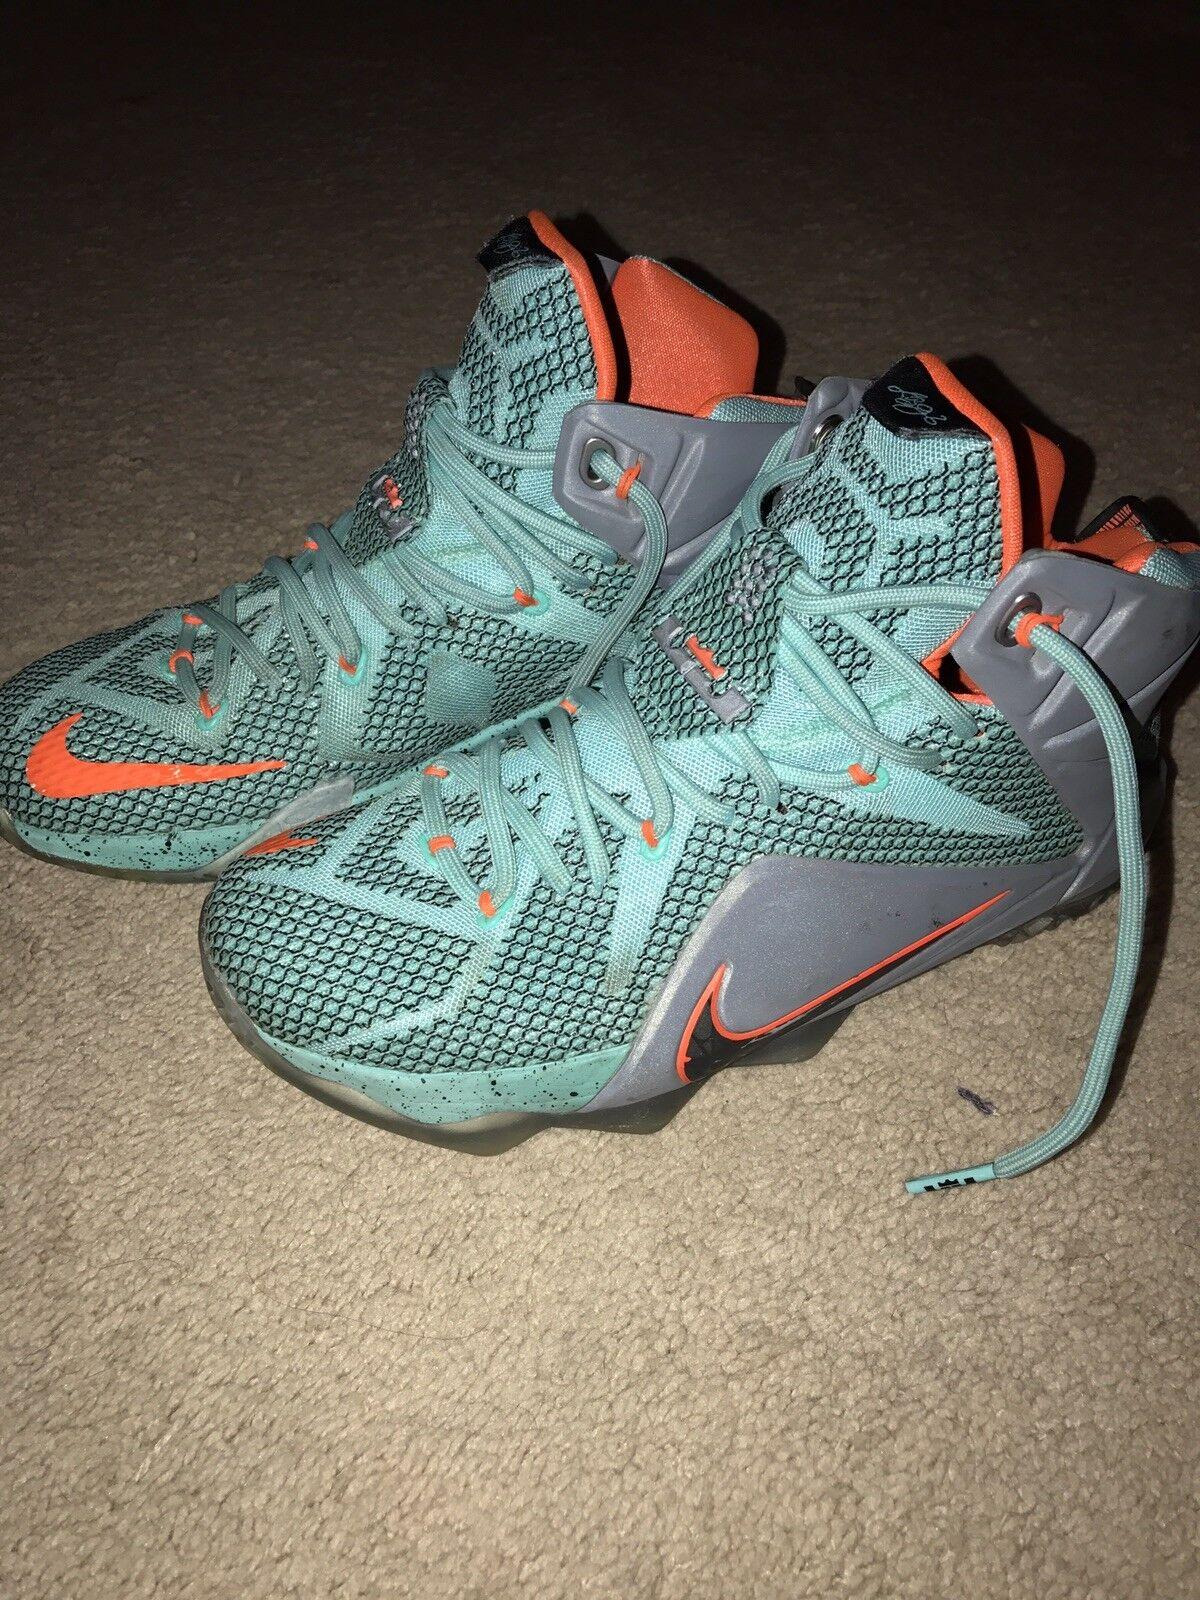 Nike lebron james xii 12 8 scarpe arancione grigio 684593-301 turchese